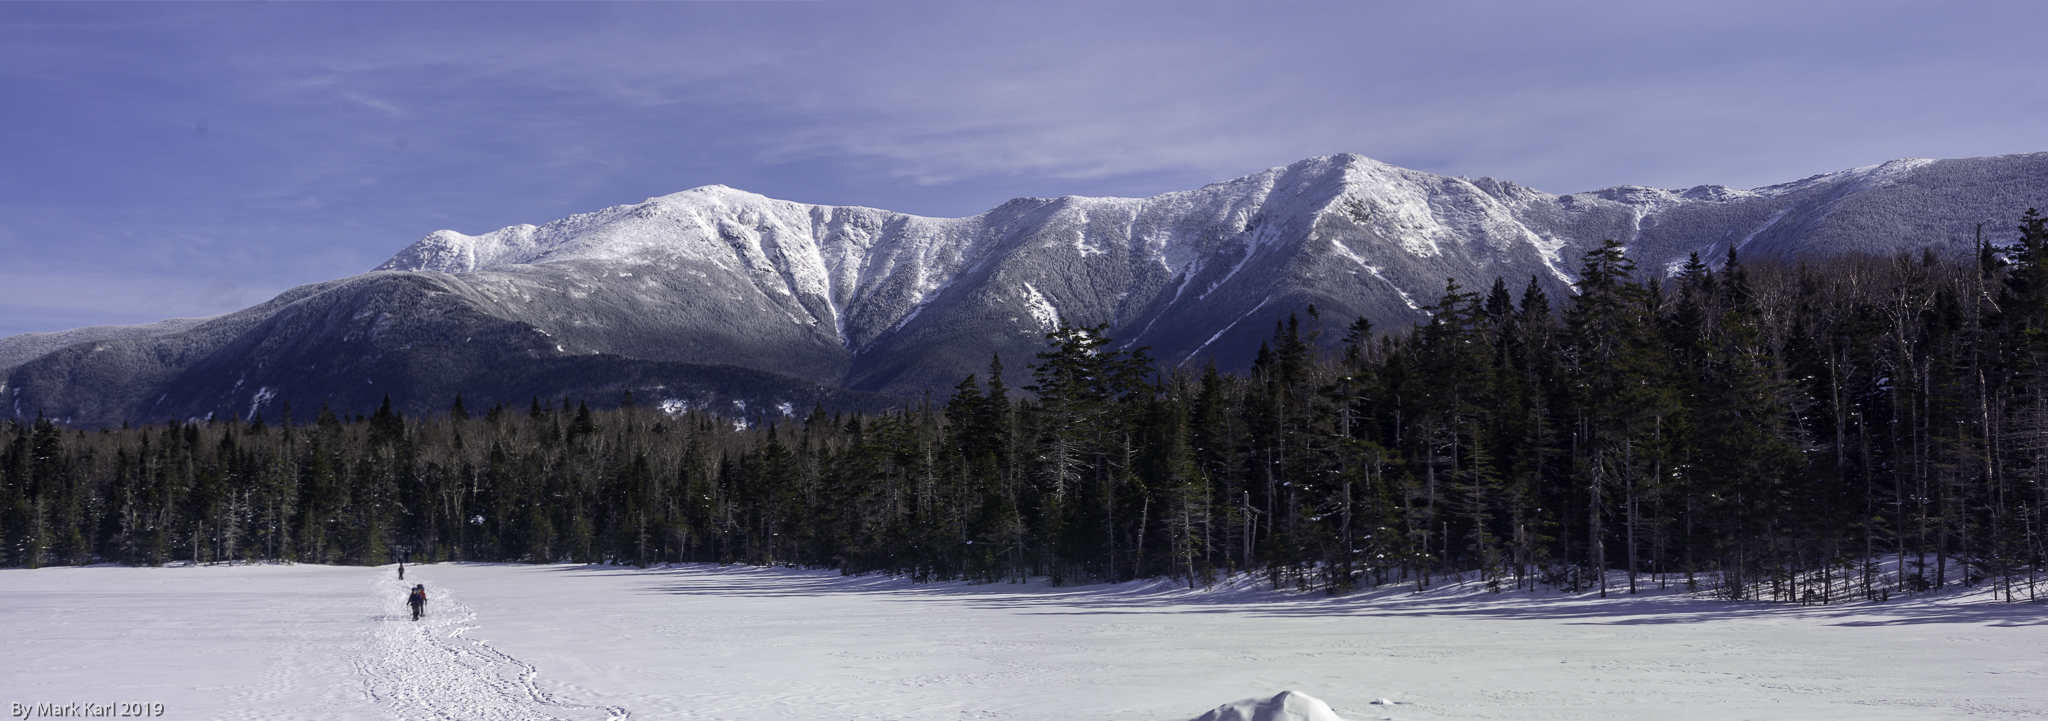 Franconia Ridge Panorama February 23 2019-1